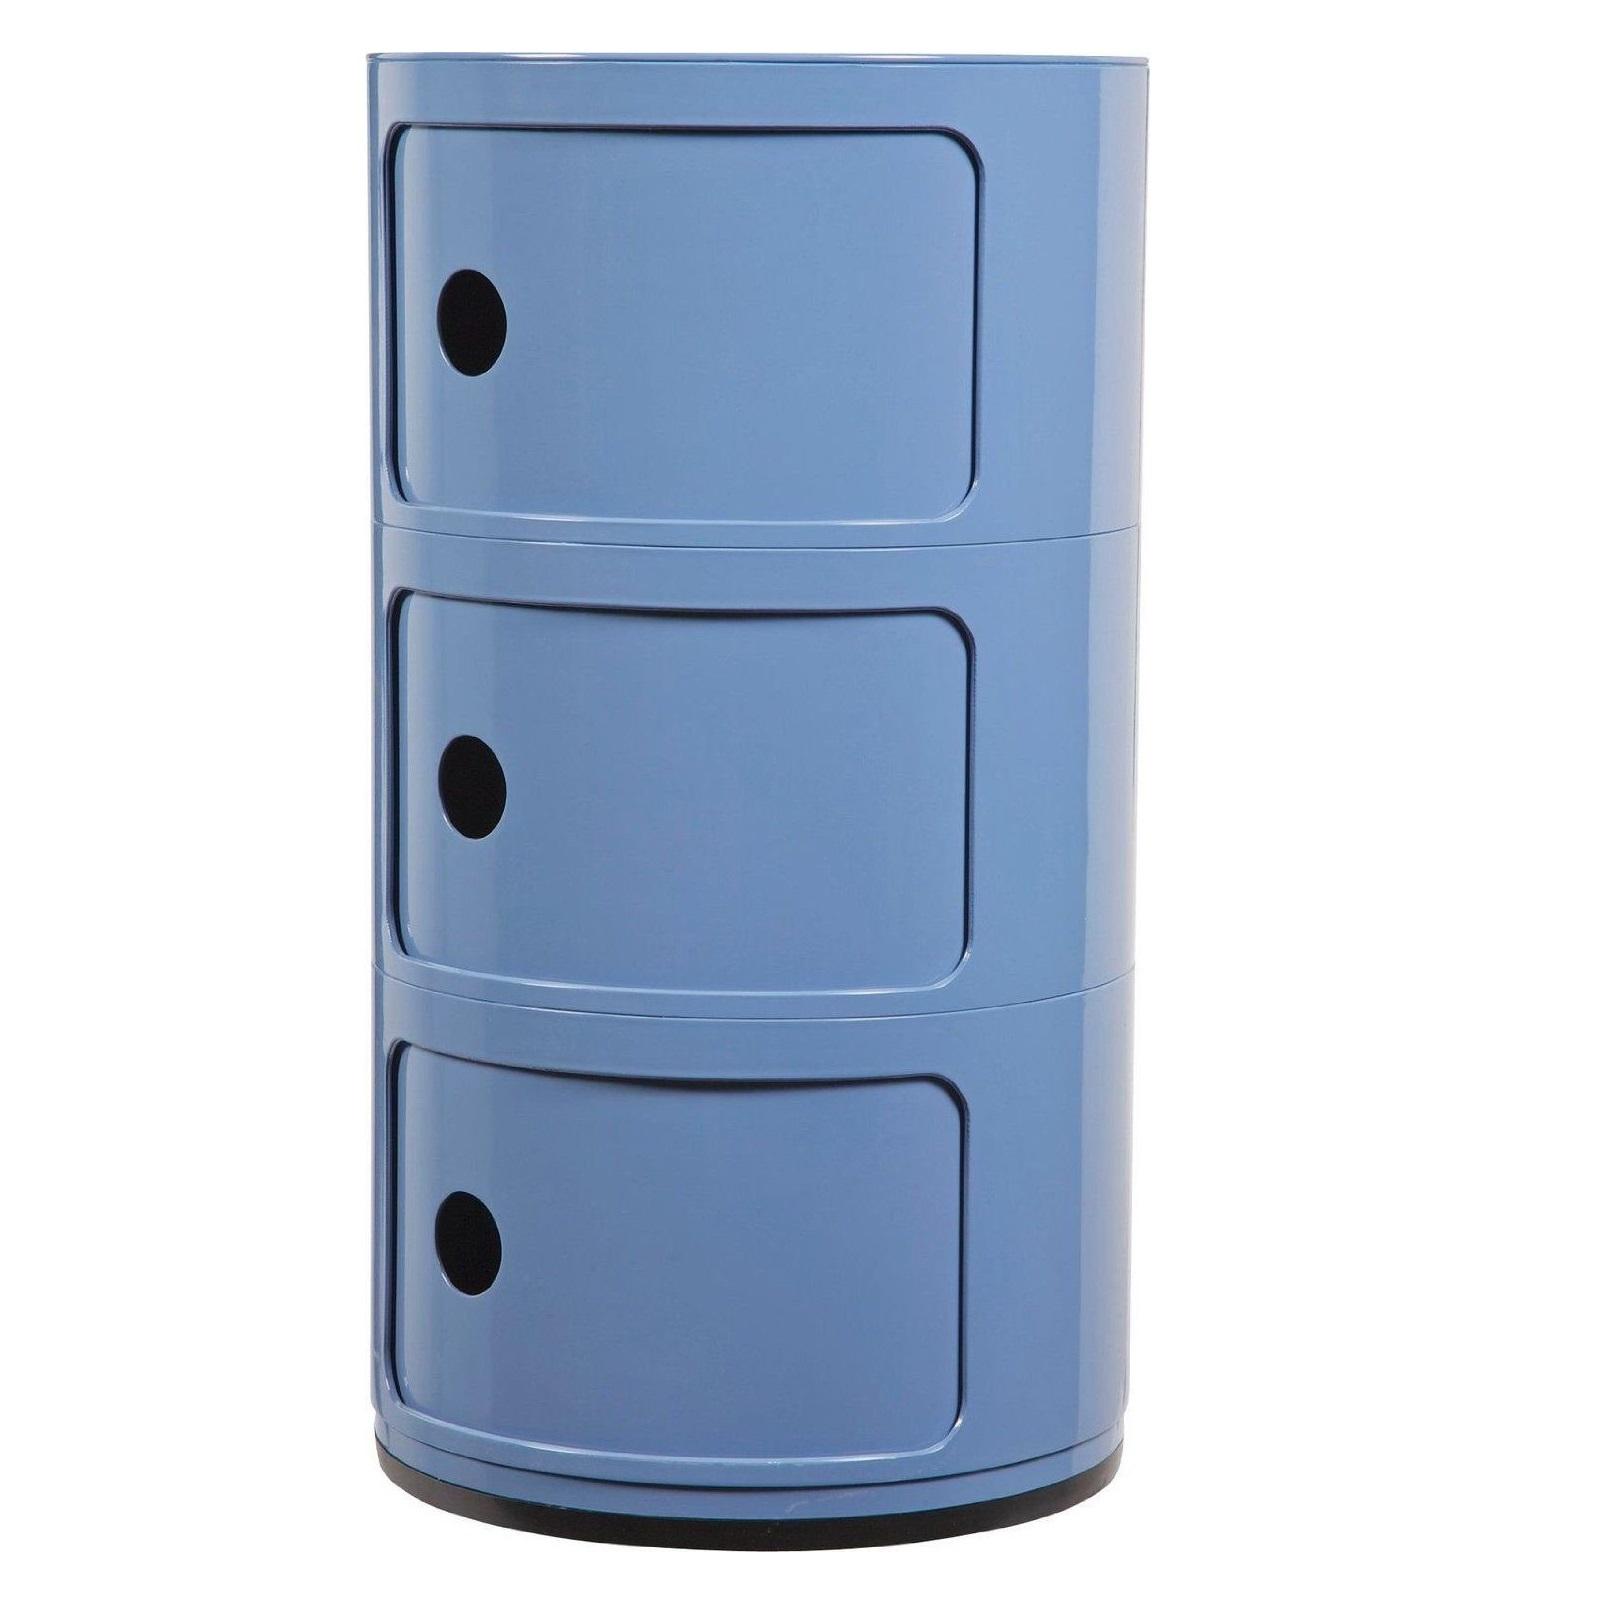 Childrens Animals Storage Box Chest 3 Kids Drawer Bedroom: Kids Drawer Storage Unit Bedroom 3 Tier Cabinet Shelf